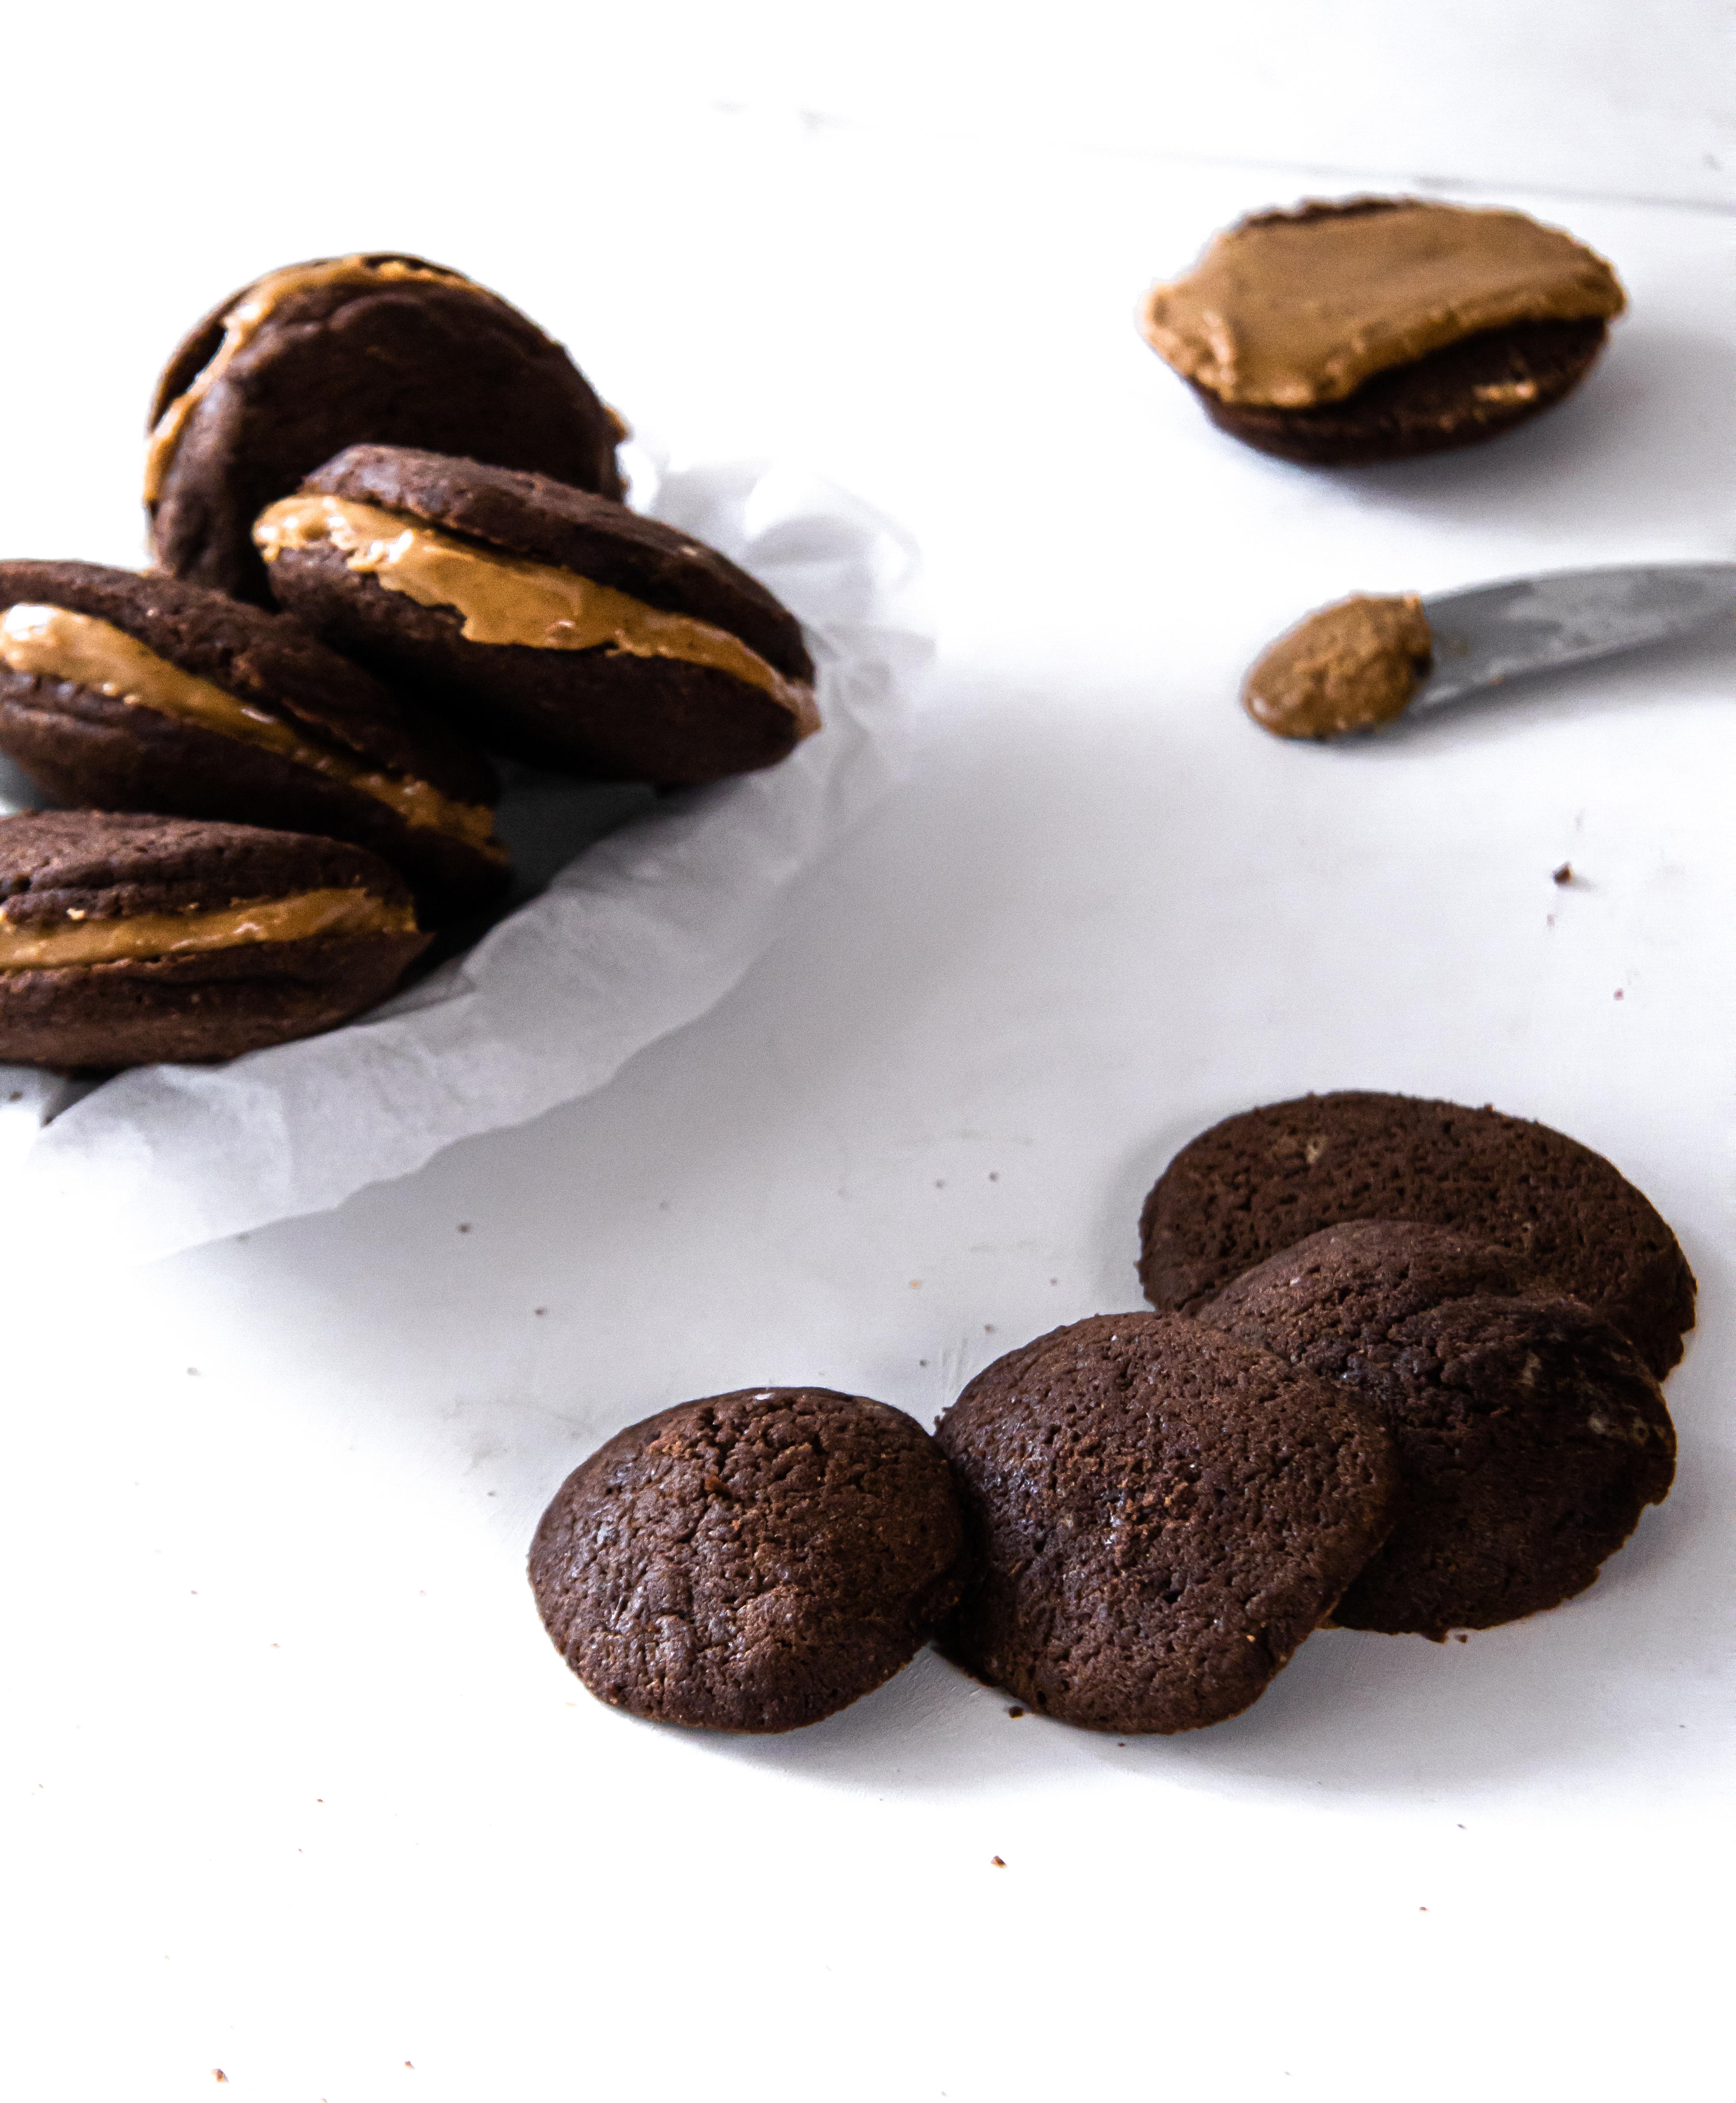 mogyivajas kekszek